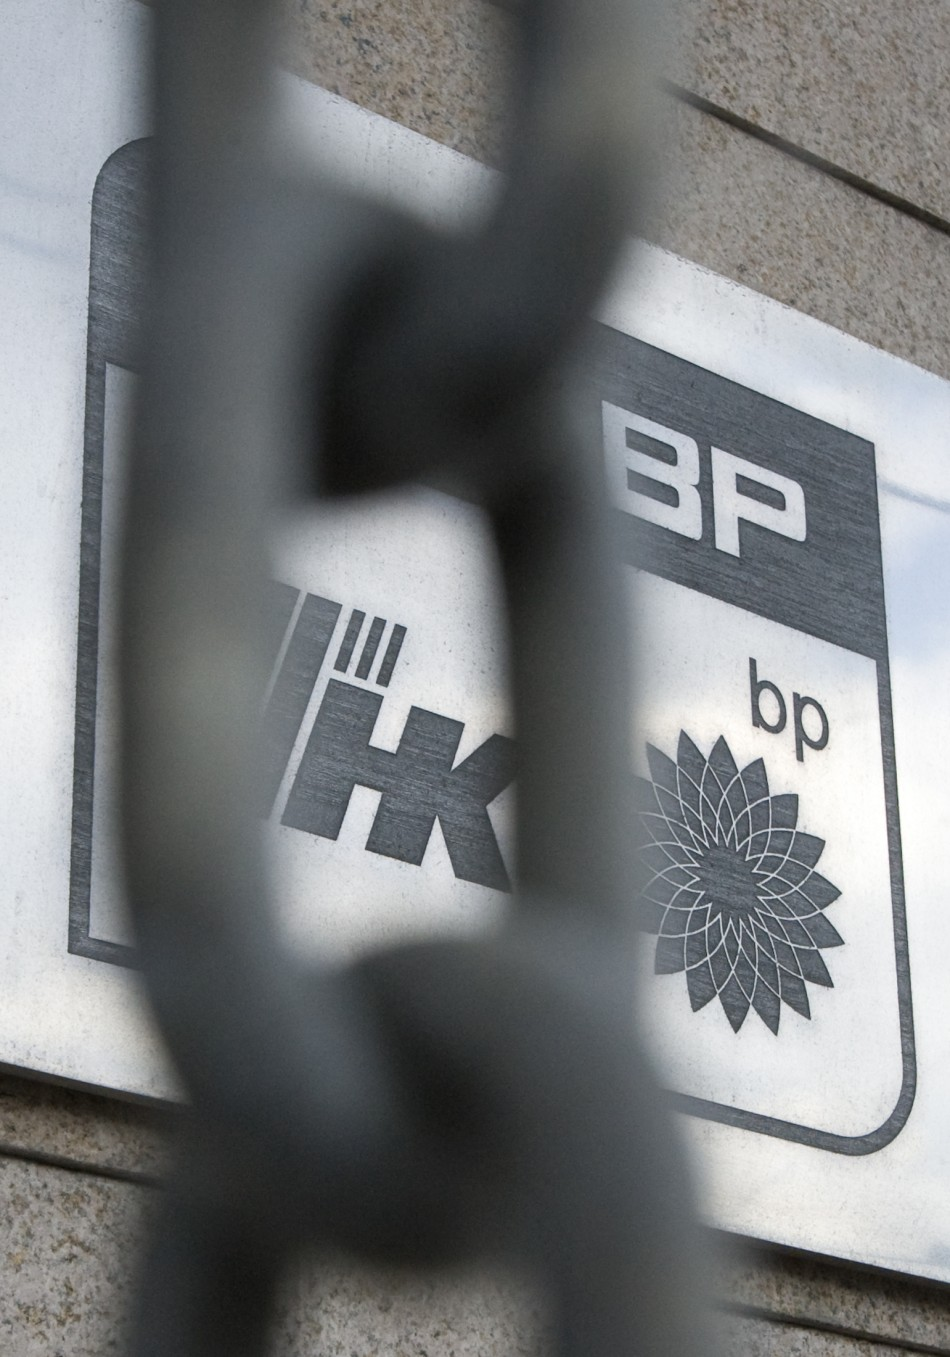 TNK BP Gazprom Rosneft